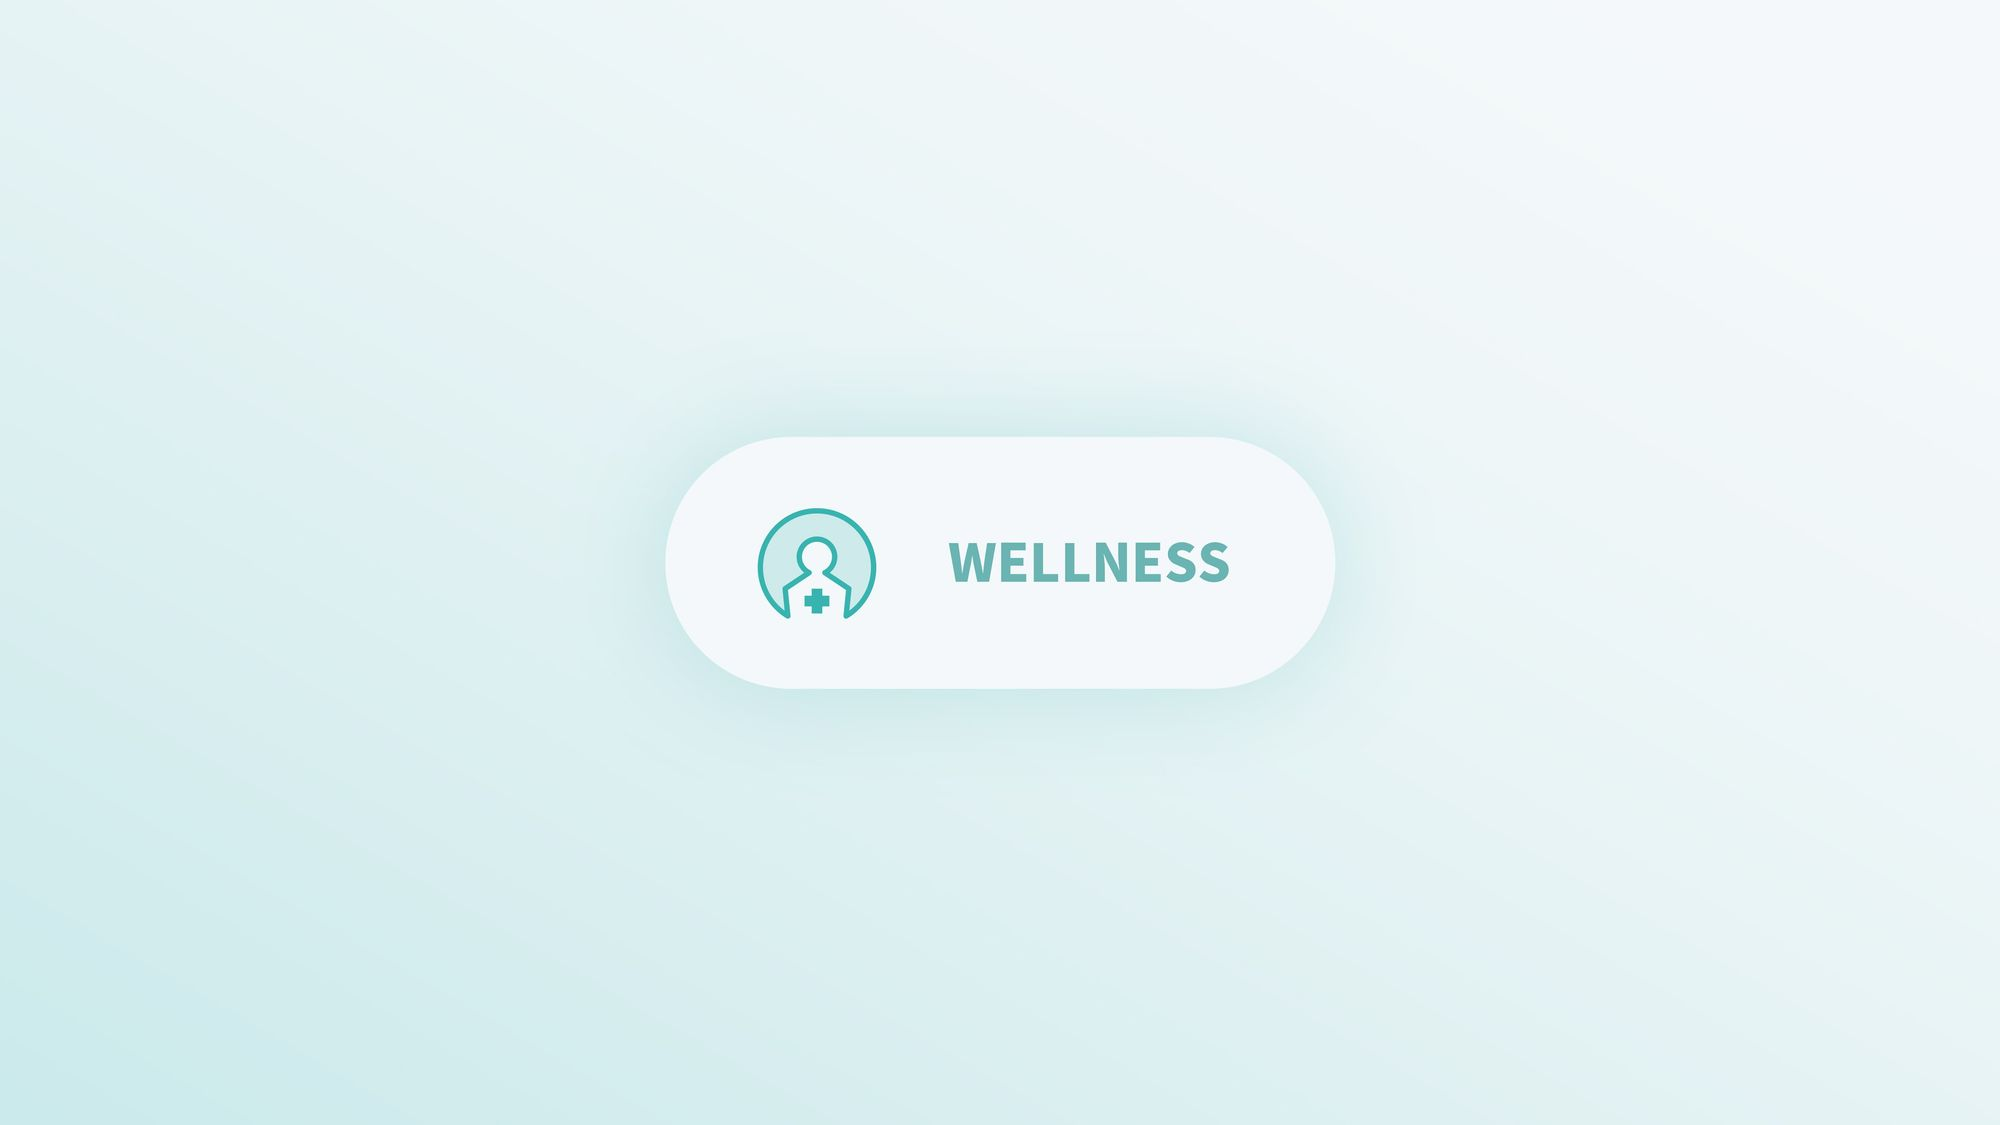 Wellness_Icon  6  3